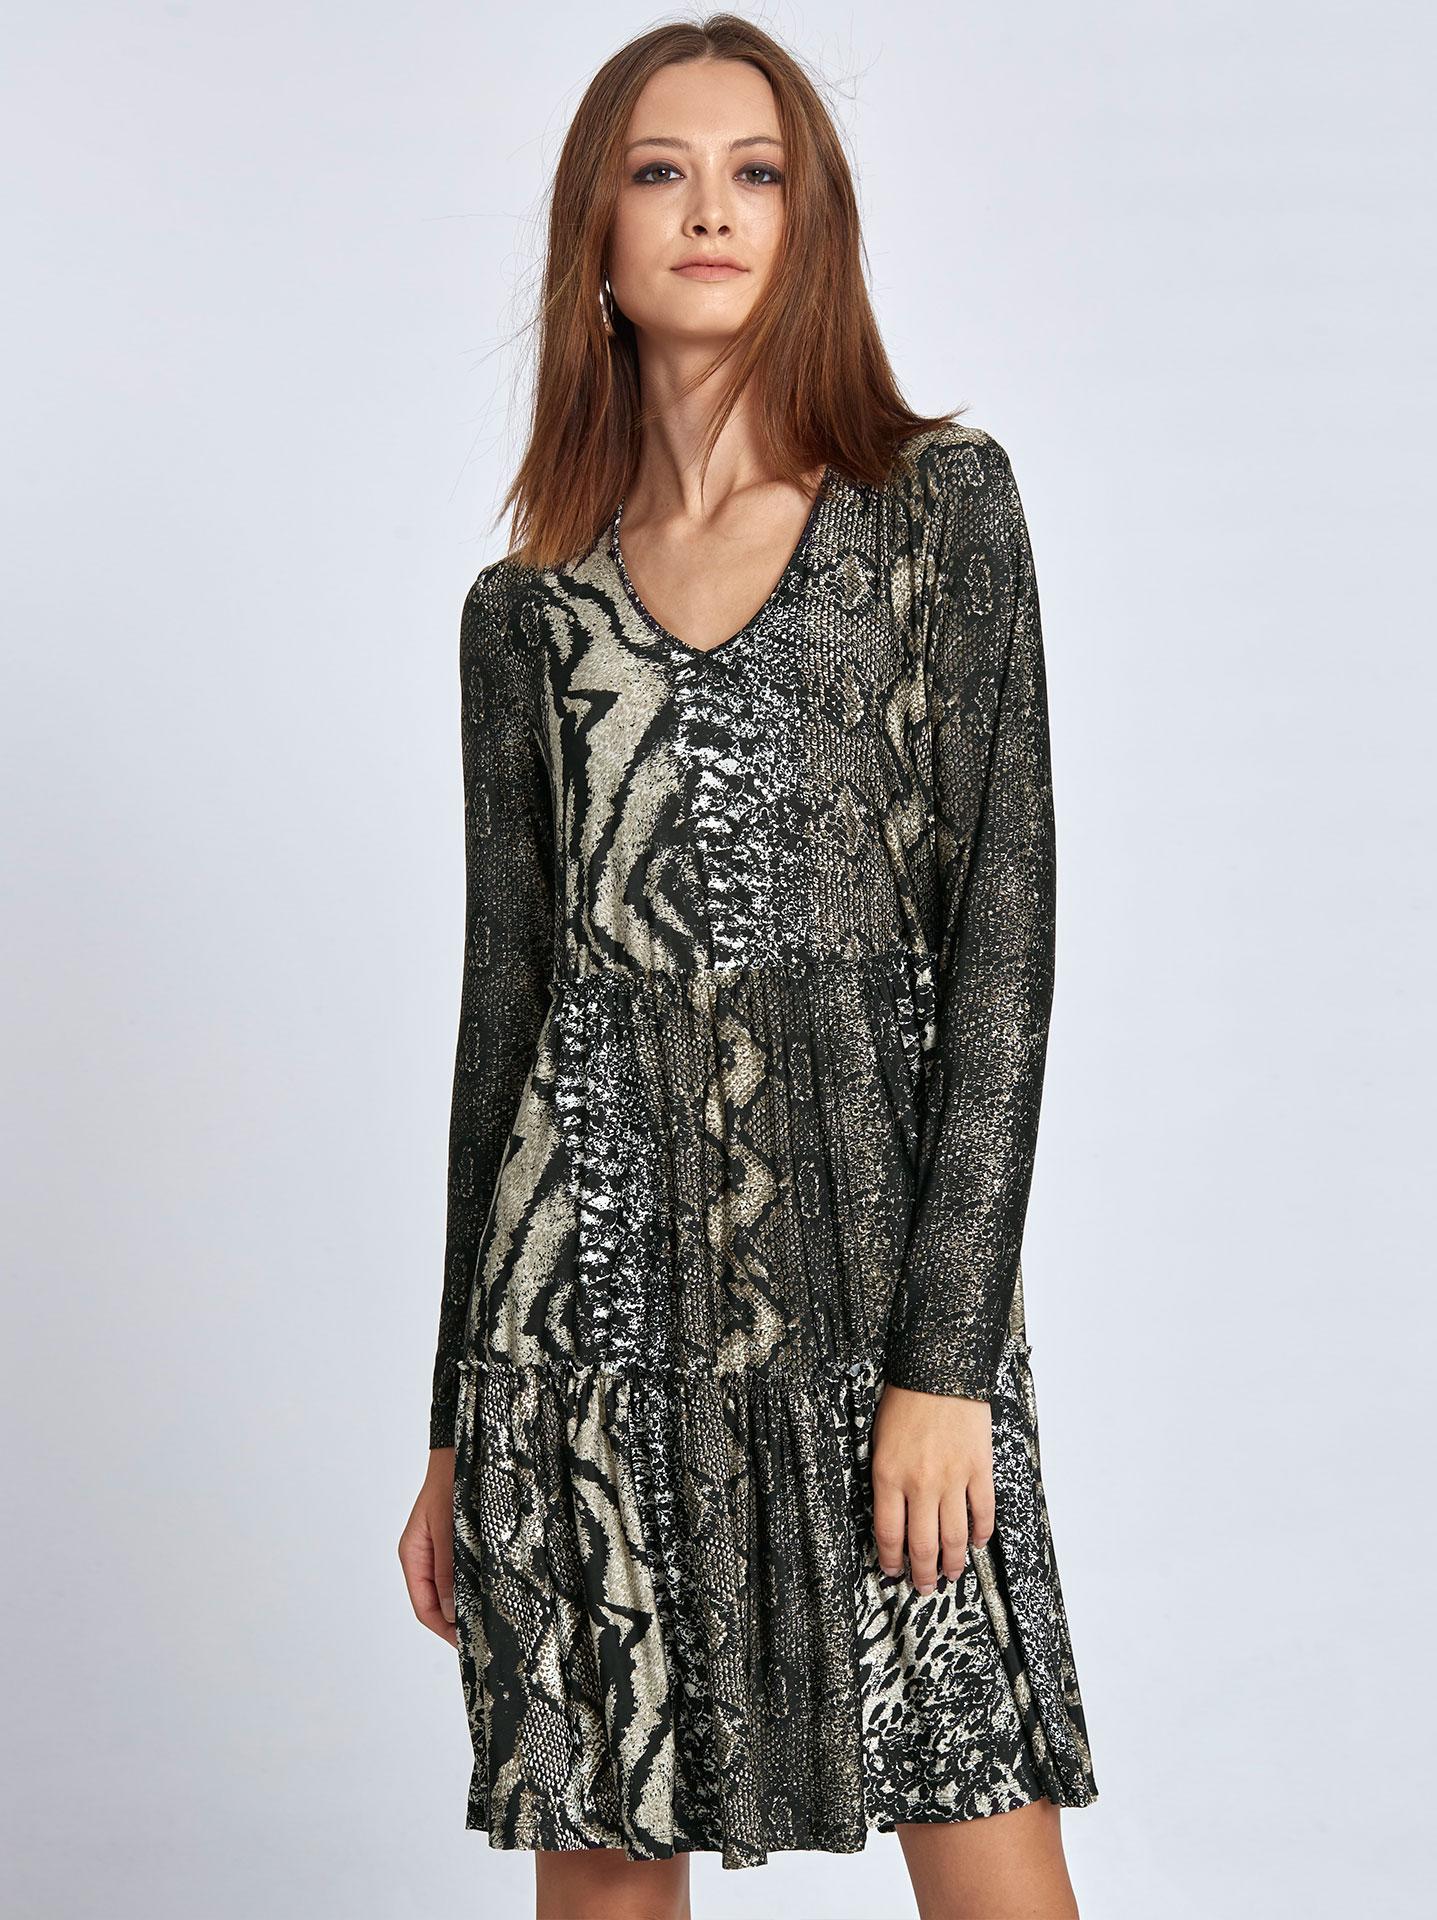 Mini ruffled dress in animal print in light brown a9f41f3c2